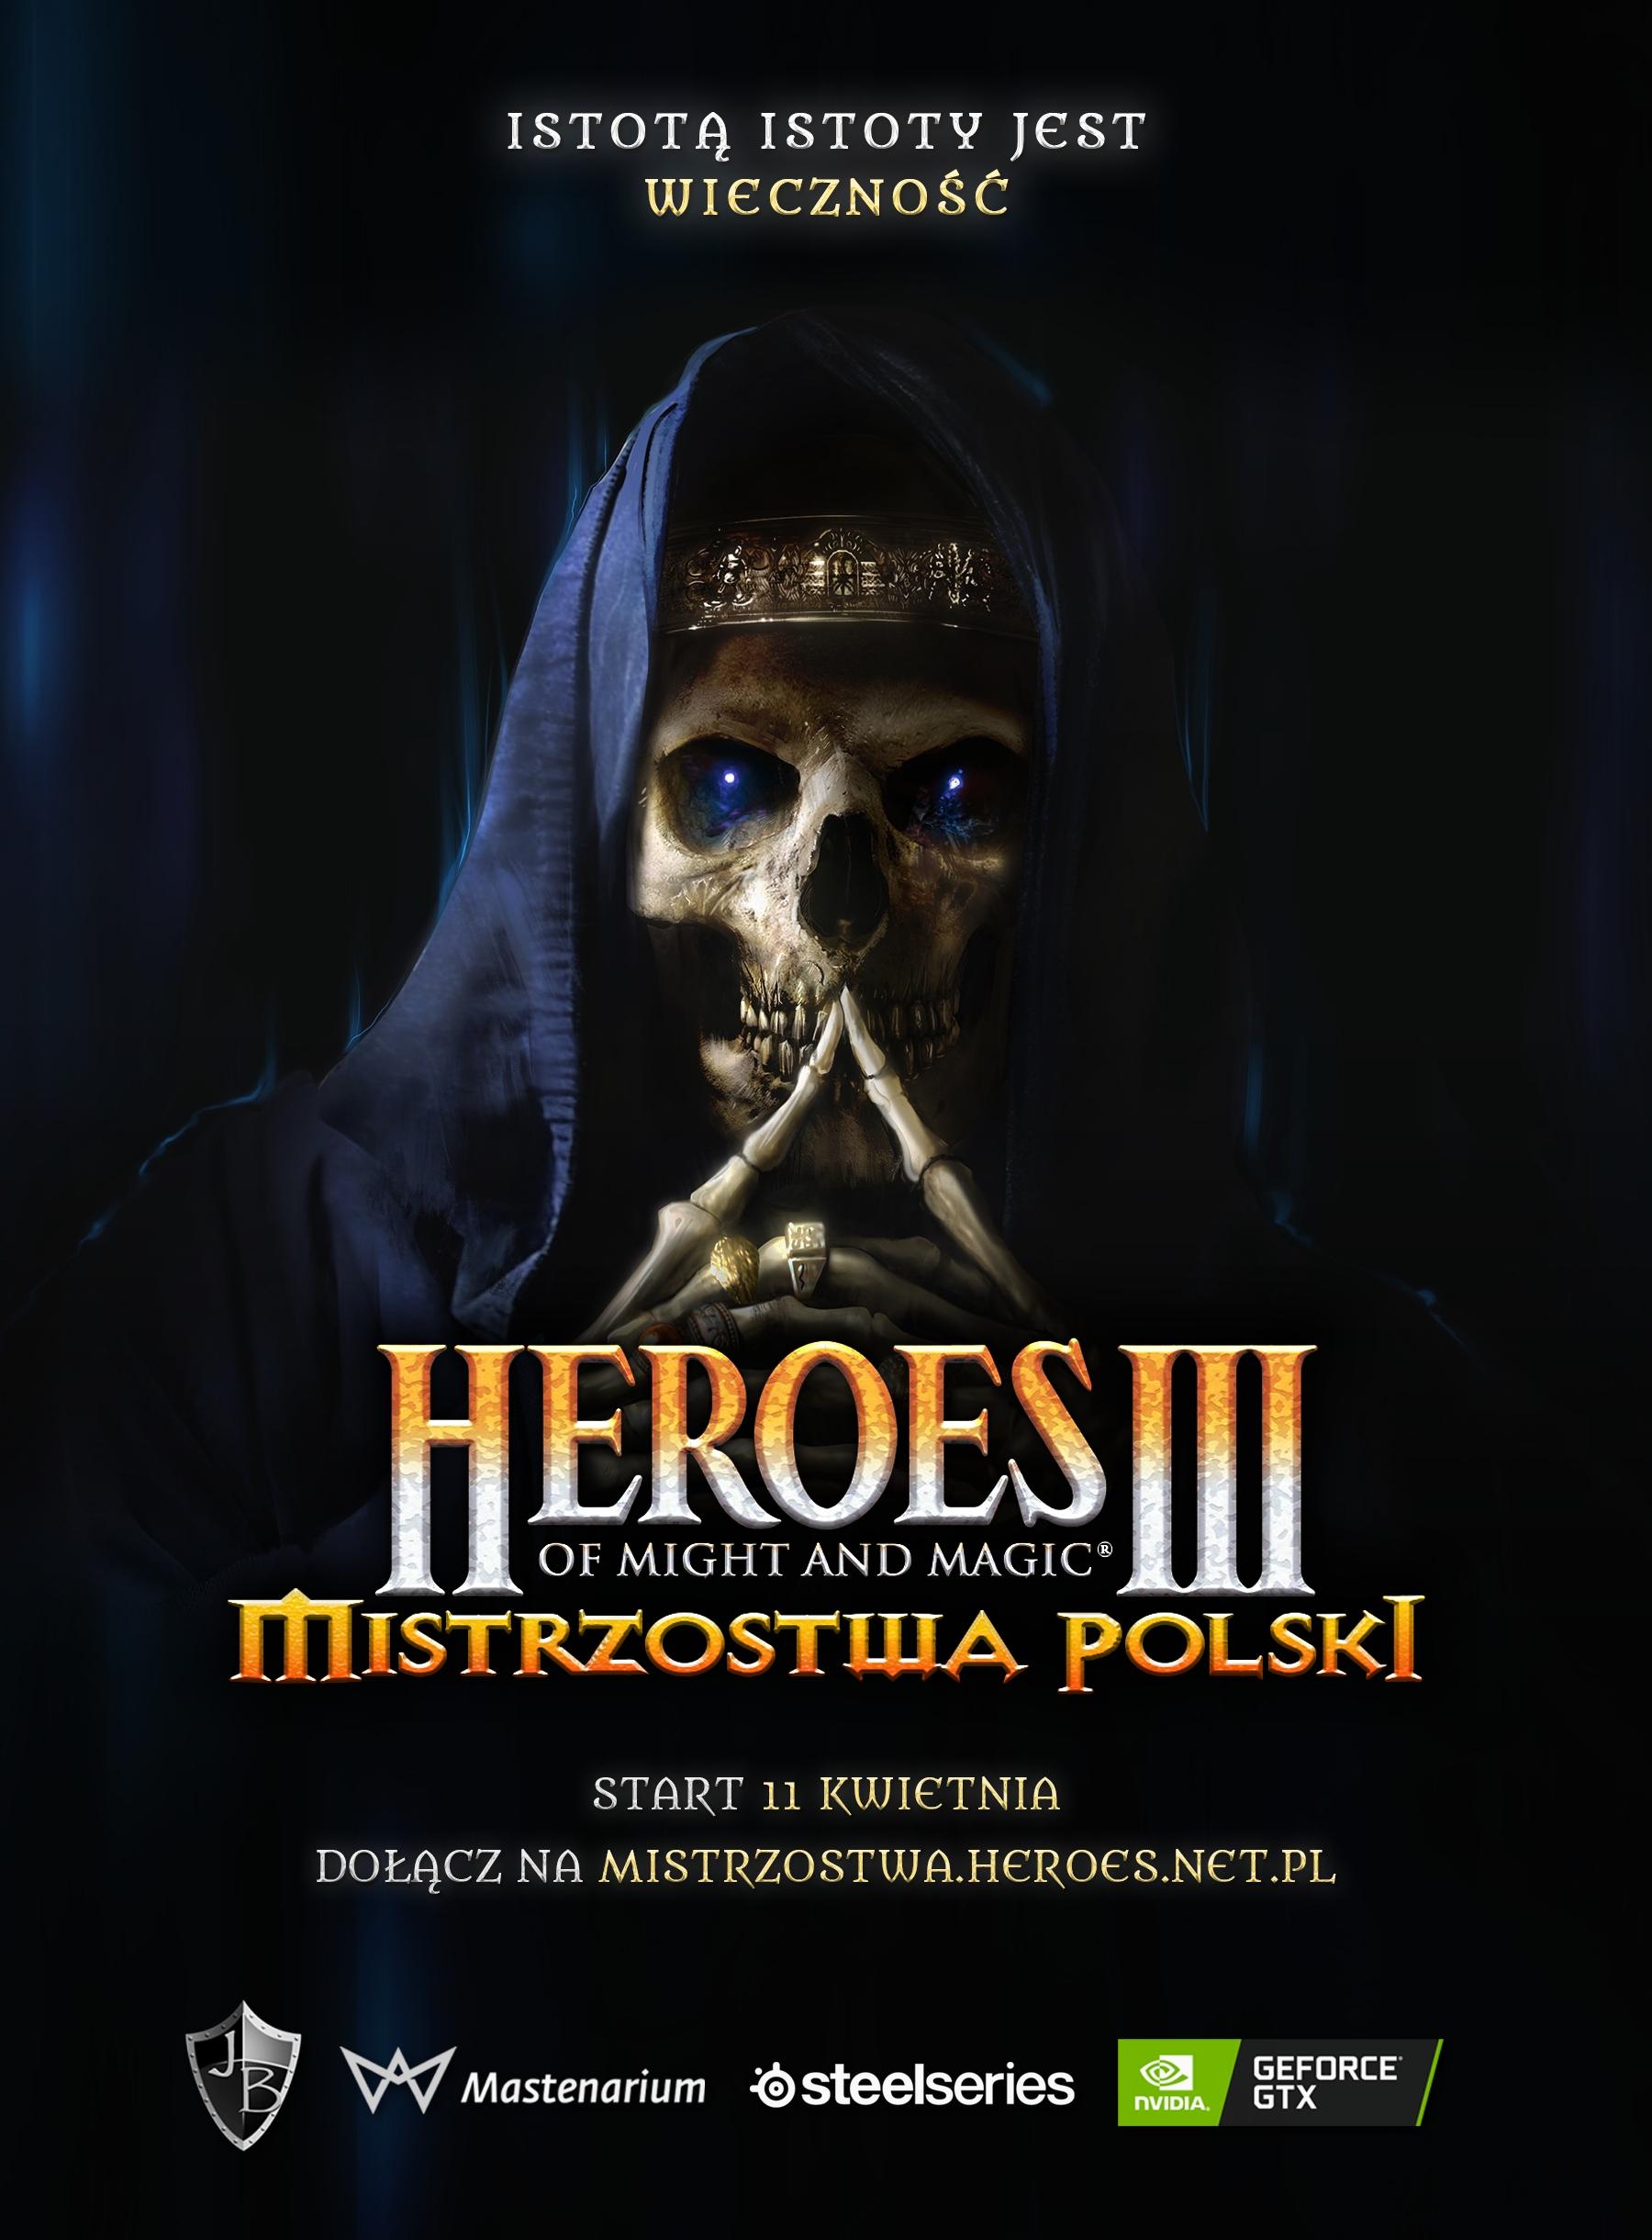 http://heroes.net.pl/uploaded///Mistrzostwa%20Polski%202020.jpg